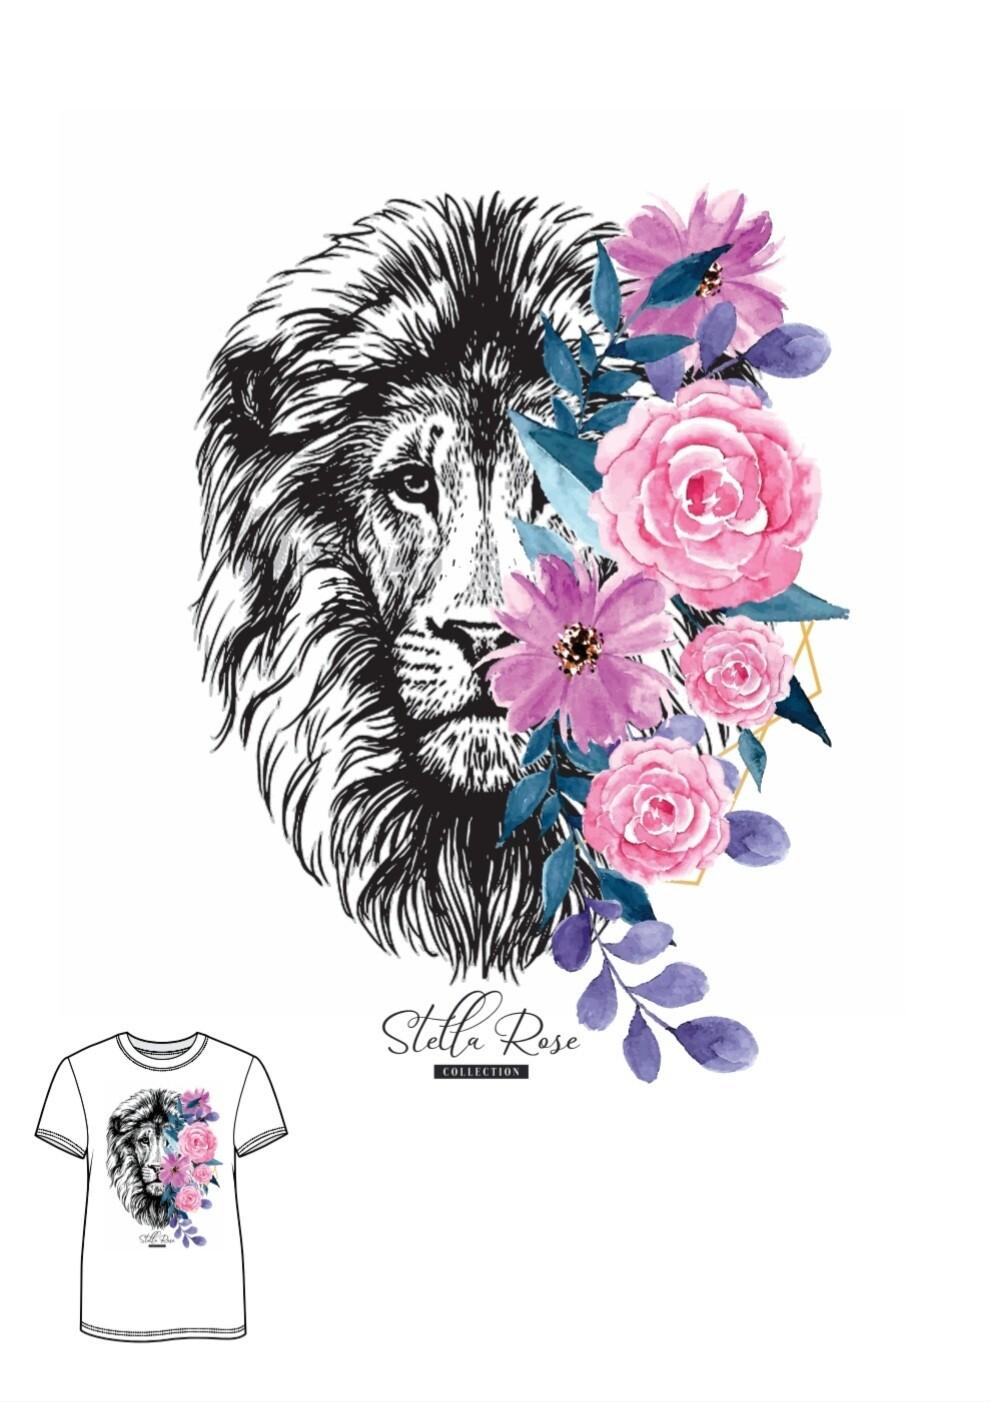 Rose Lion T-shirt